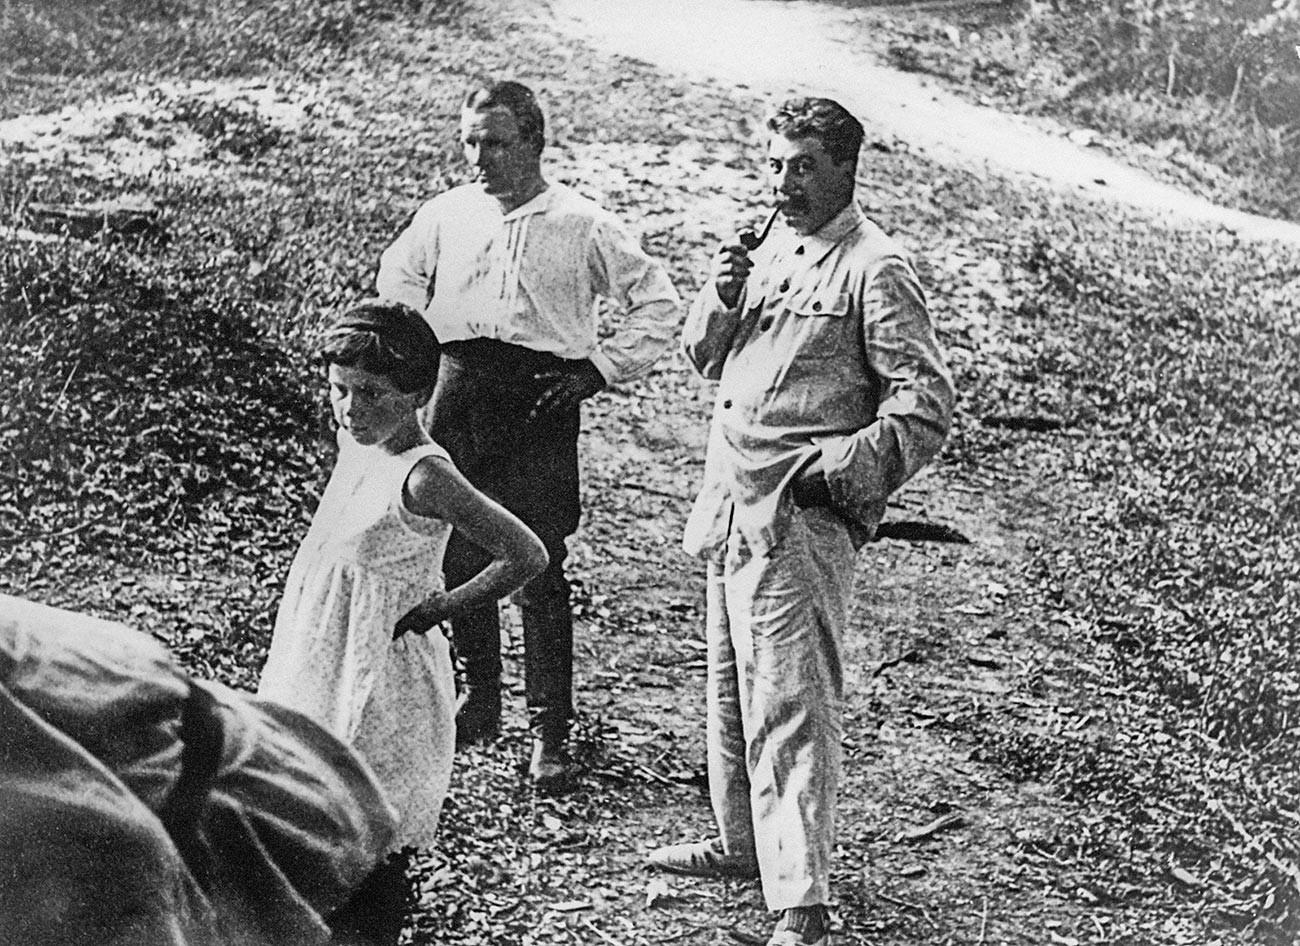 Йосиф Сталин, Сергей Киров и дъщерята на Сталин Светлана Алилуева. 1930 г.